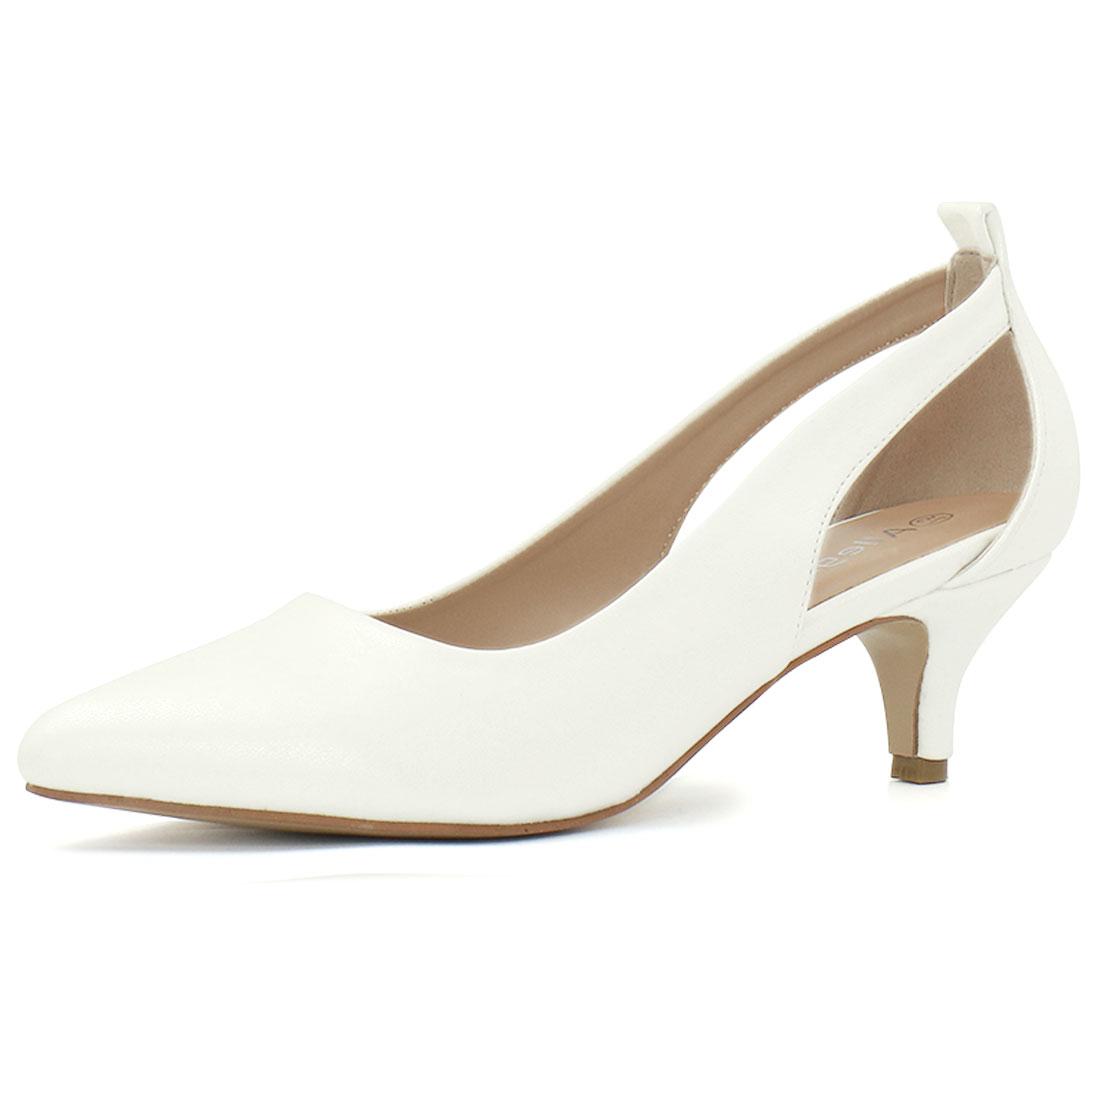 Allegra K Women's Cutout Sides Kitten Heel Pointed Toe Pumps White US 6.5